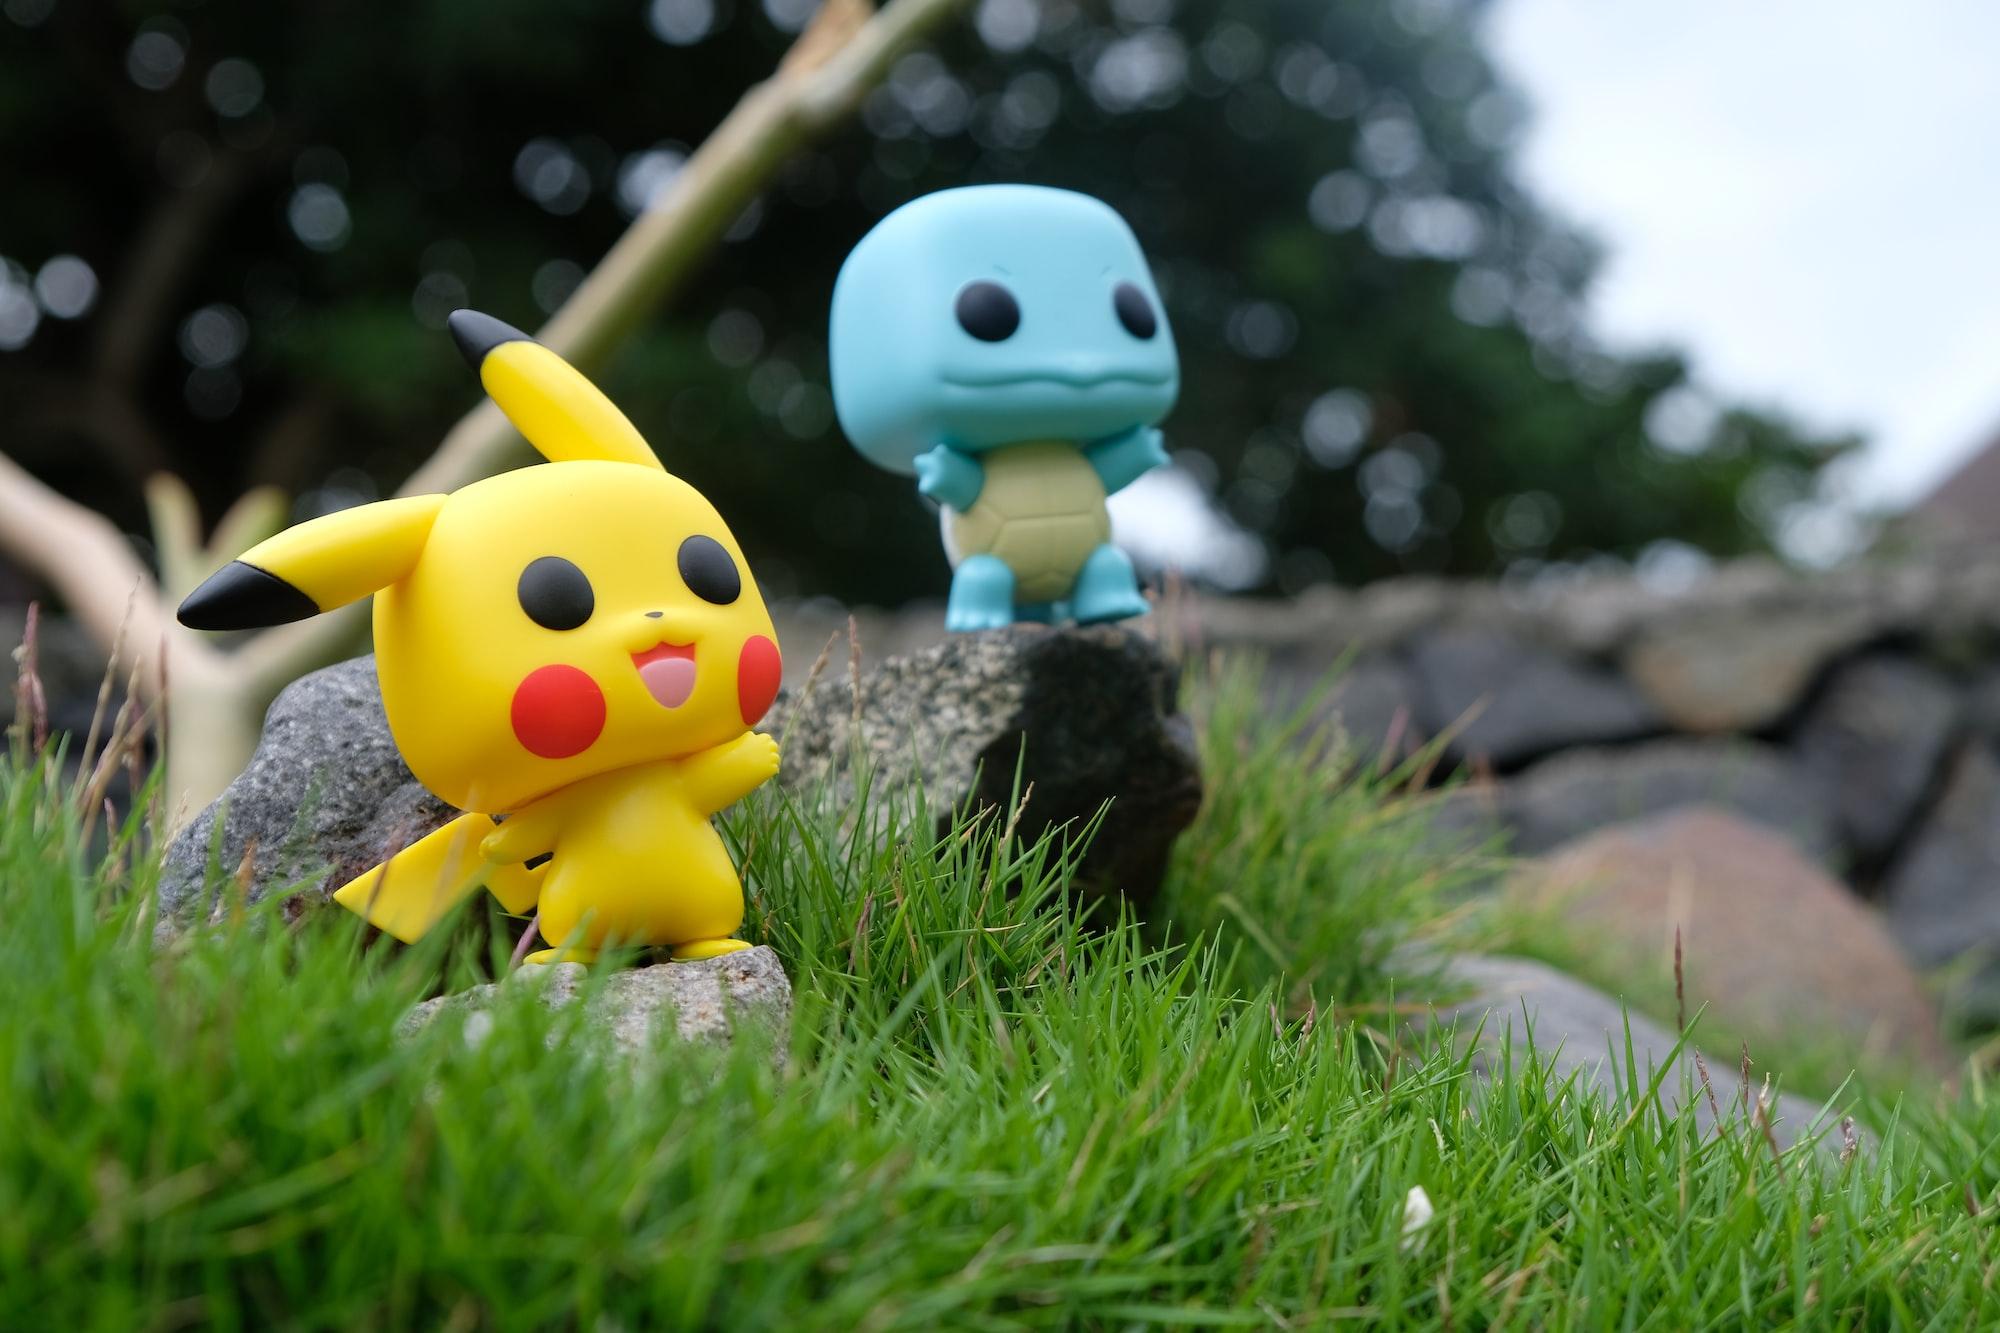 Analyzing the Game Design of Pokemon